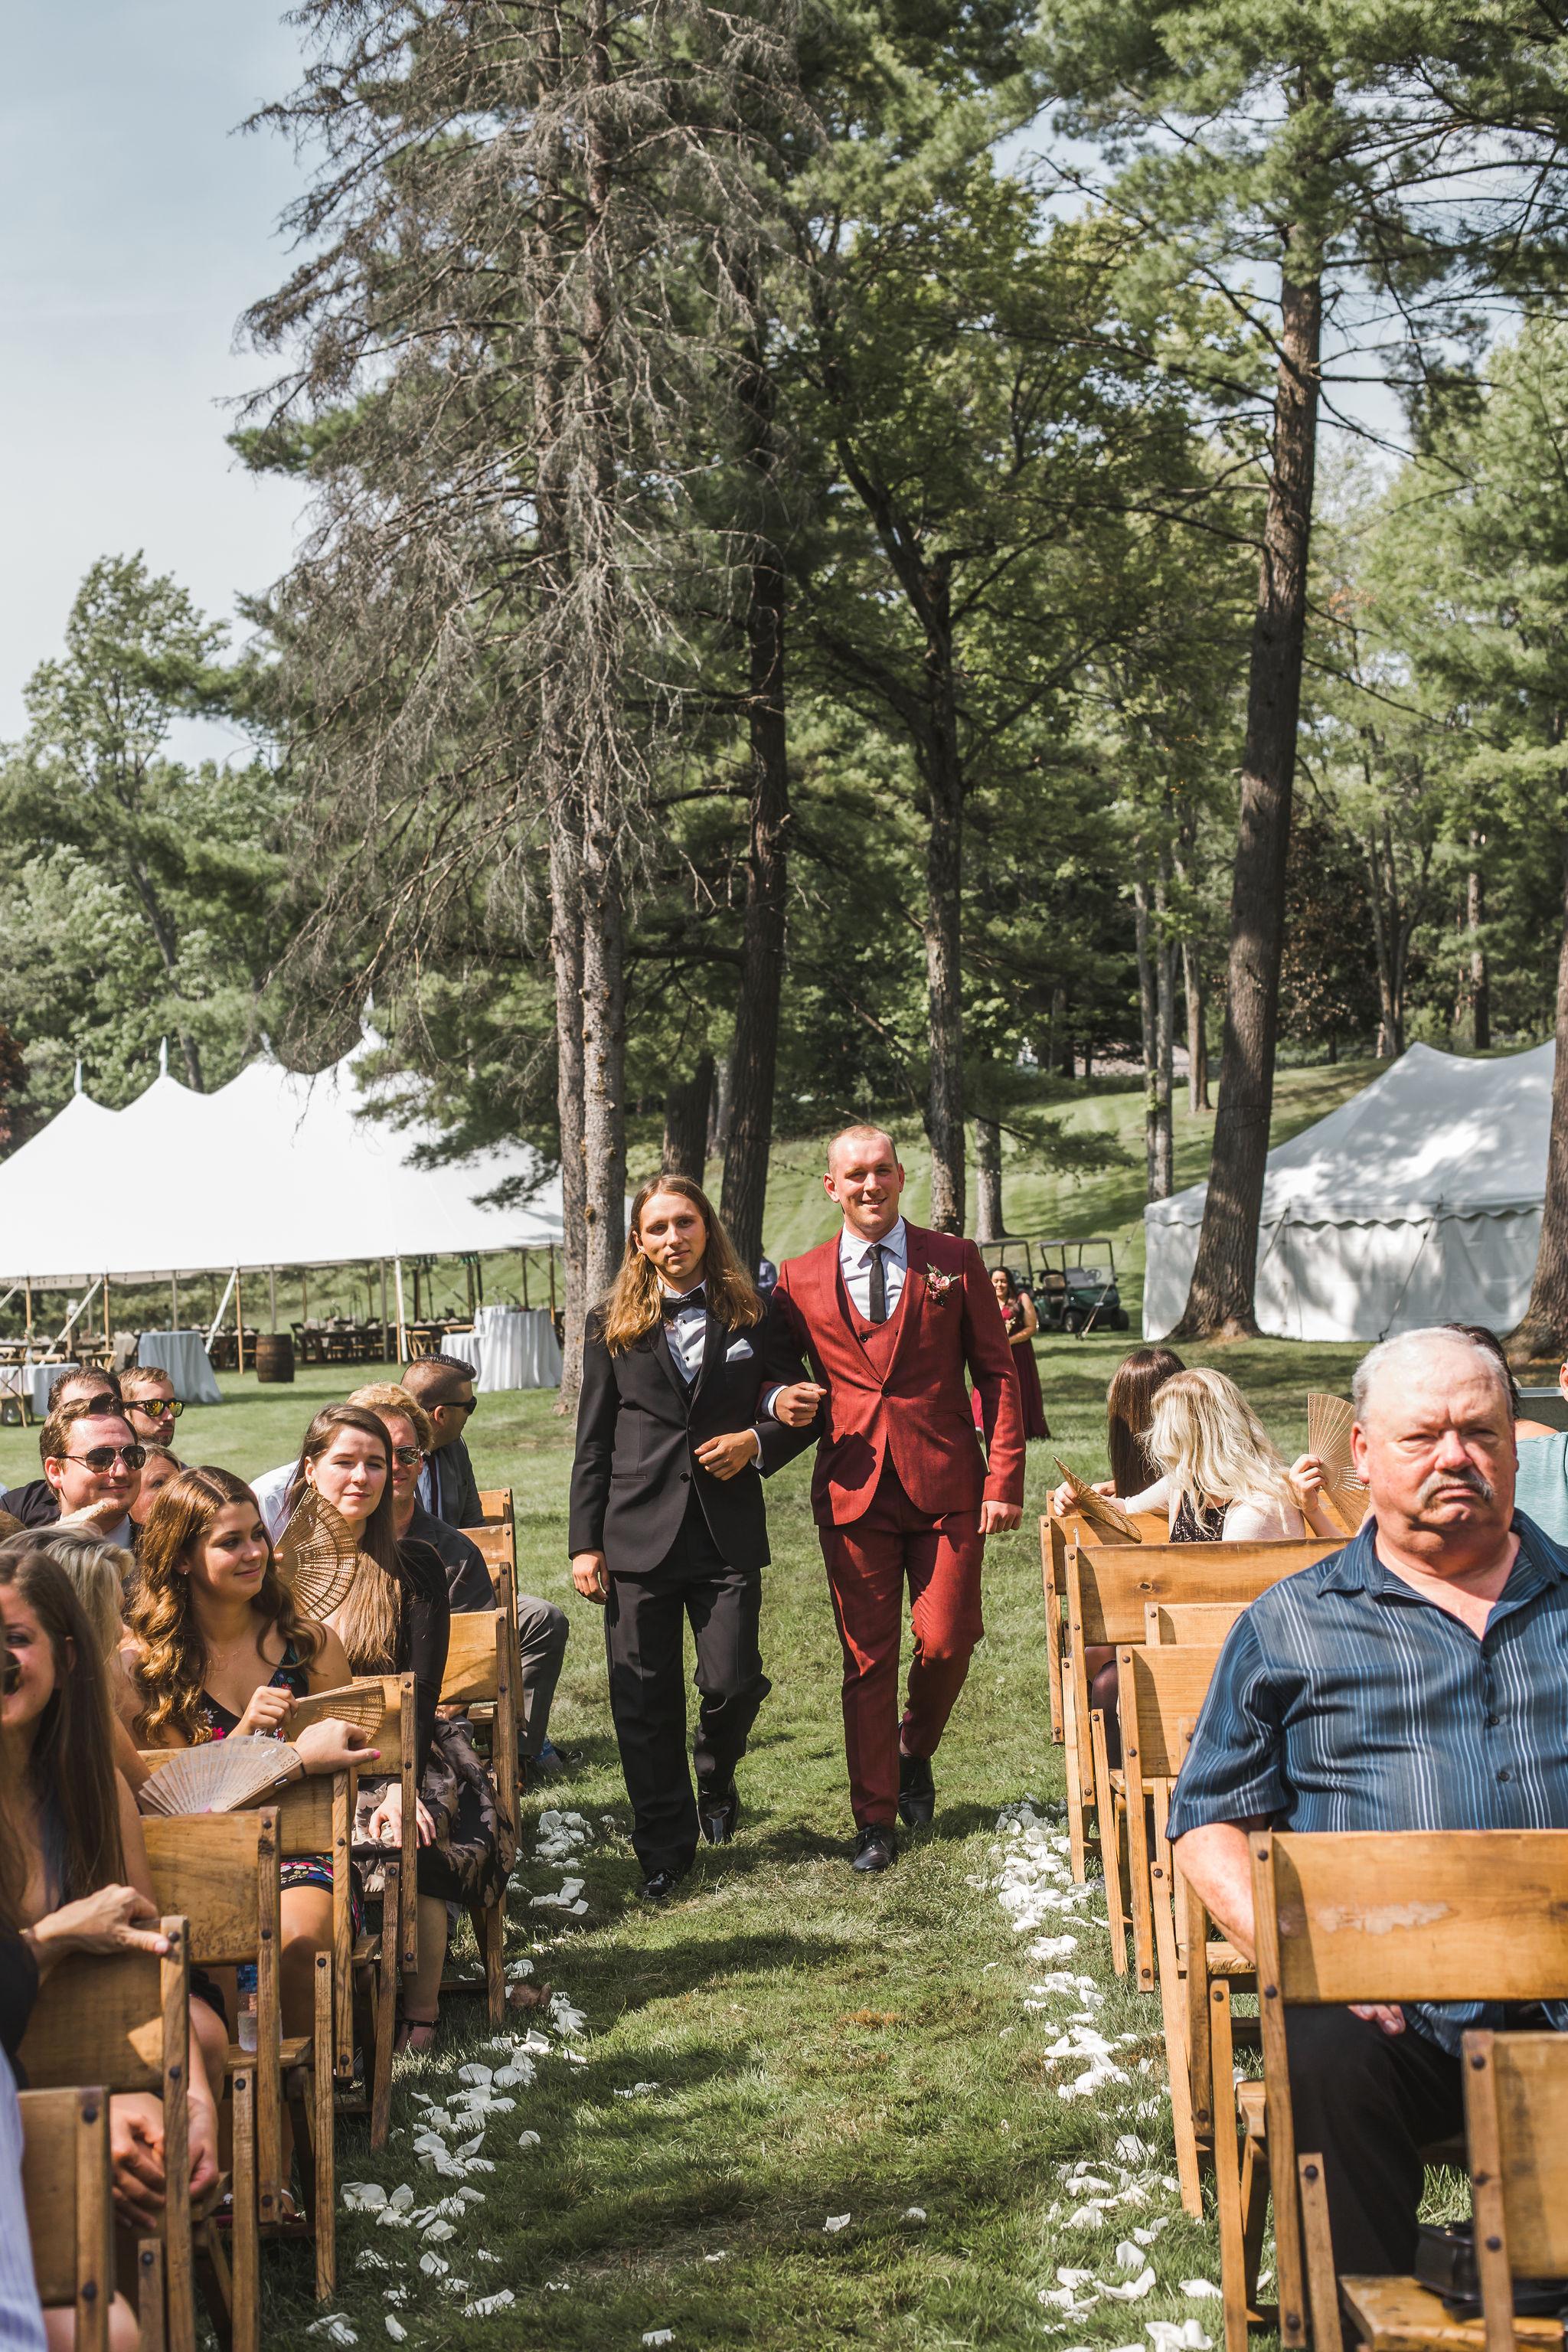 Red wedding suit